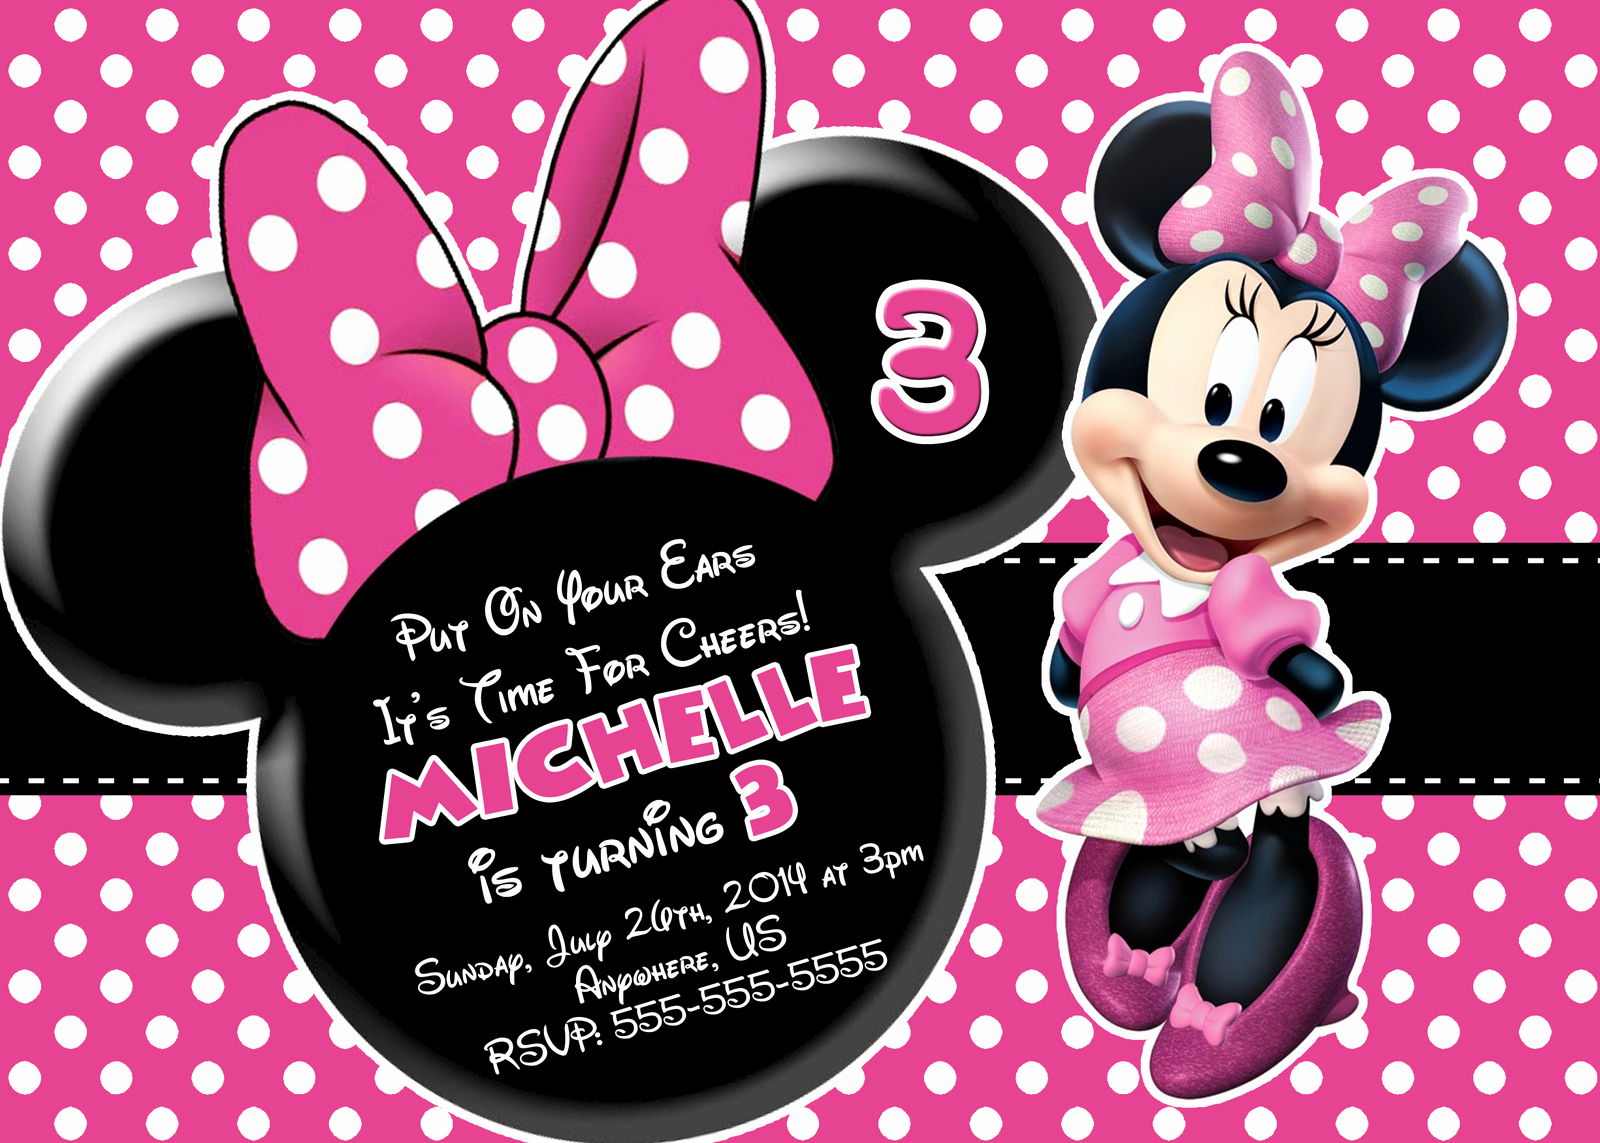 Minnie Mouse Invitation Template Free Beautiful Free Minnie Mouse Printable Birthday Invitations